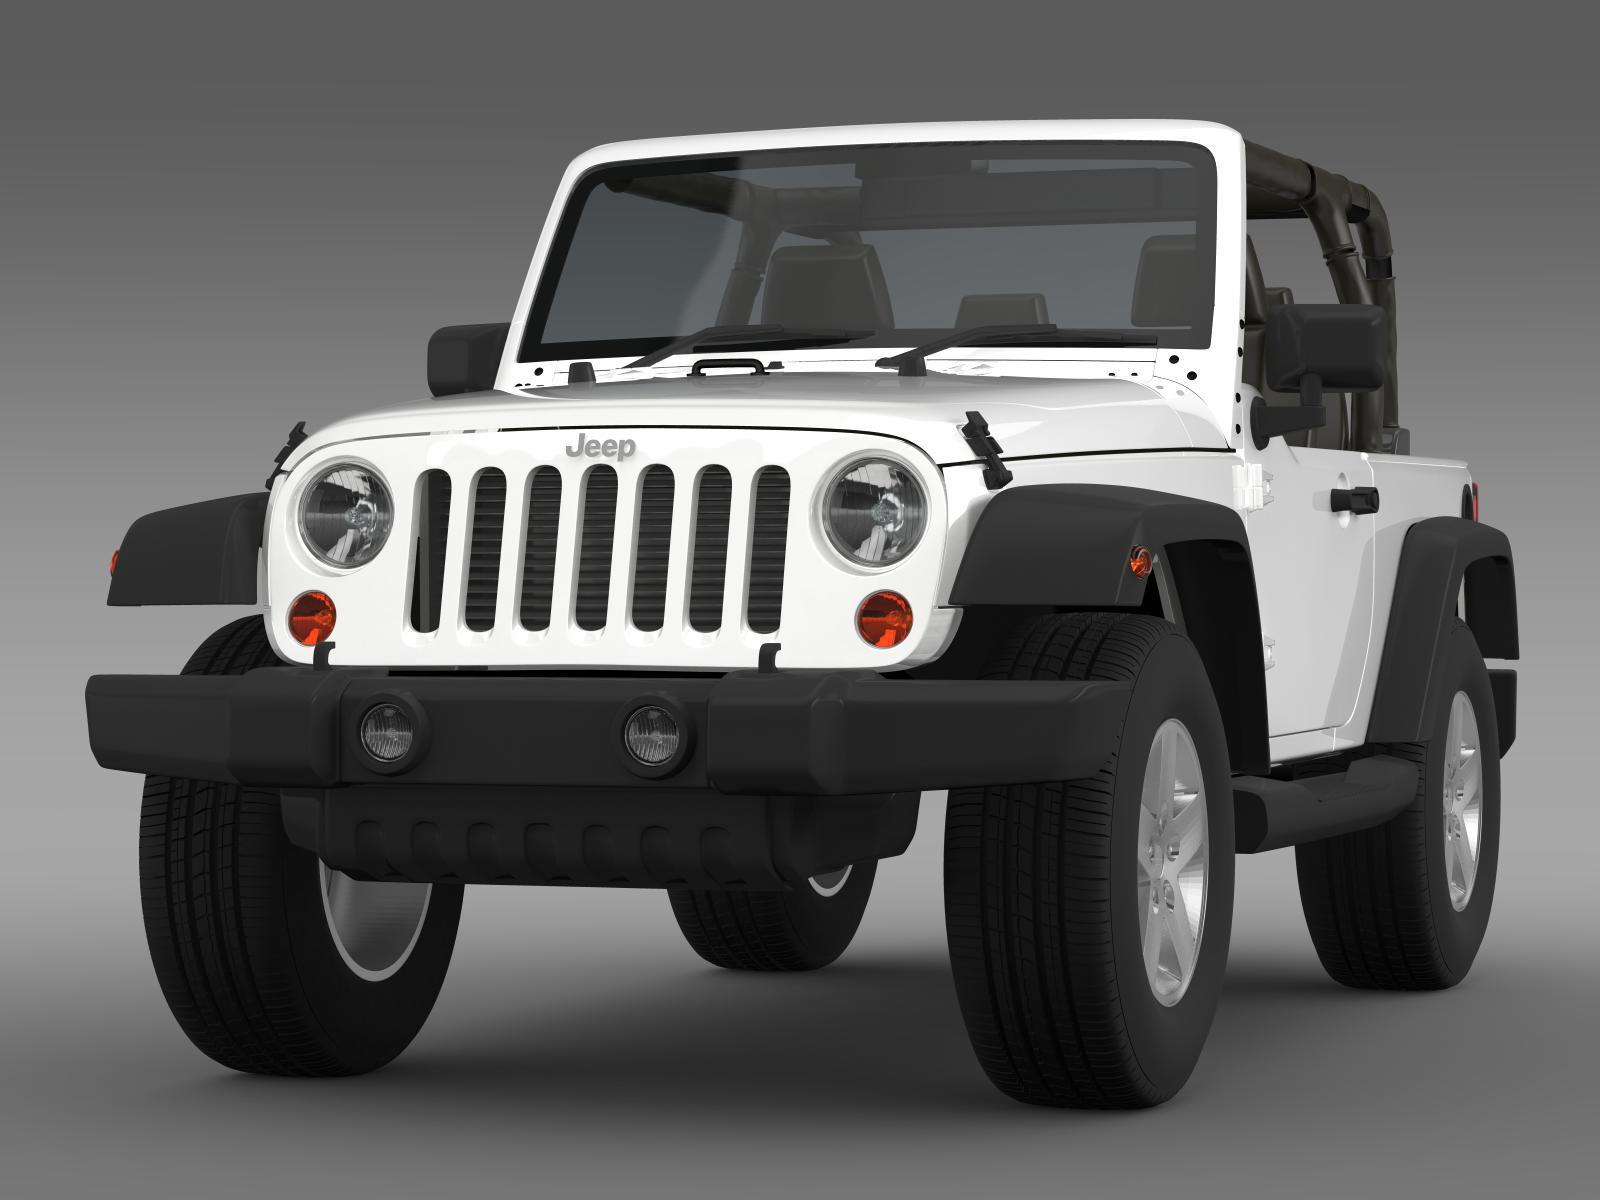 jeep wrangler islander edition 2010 by creator 3d 3docean. Black Bedroom Furniture Sets. Home Design Ideas